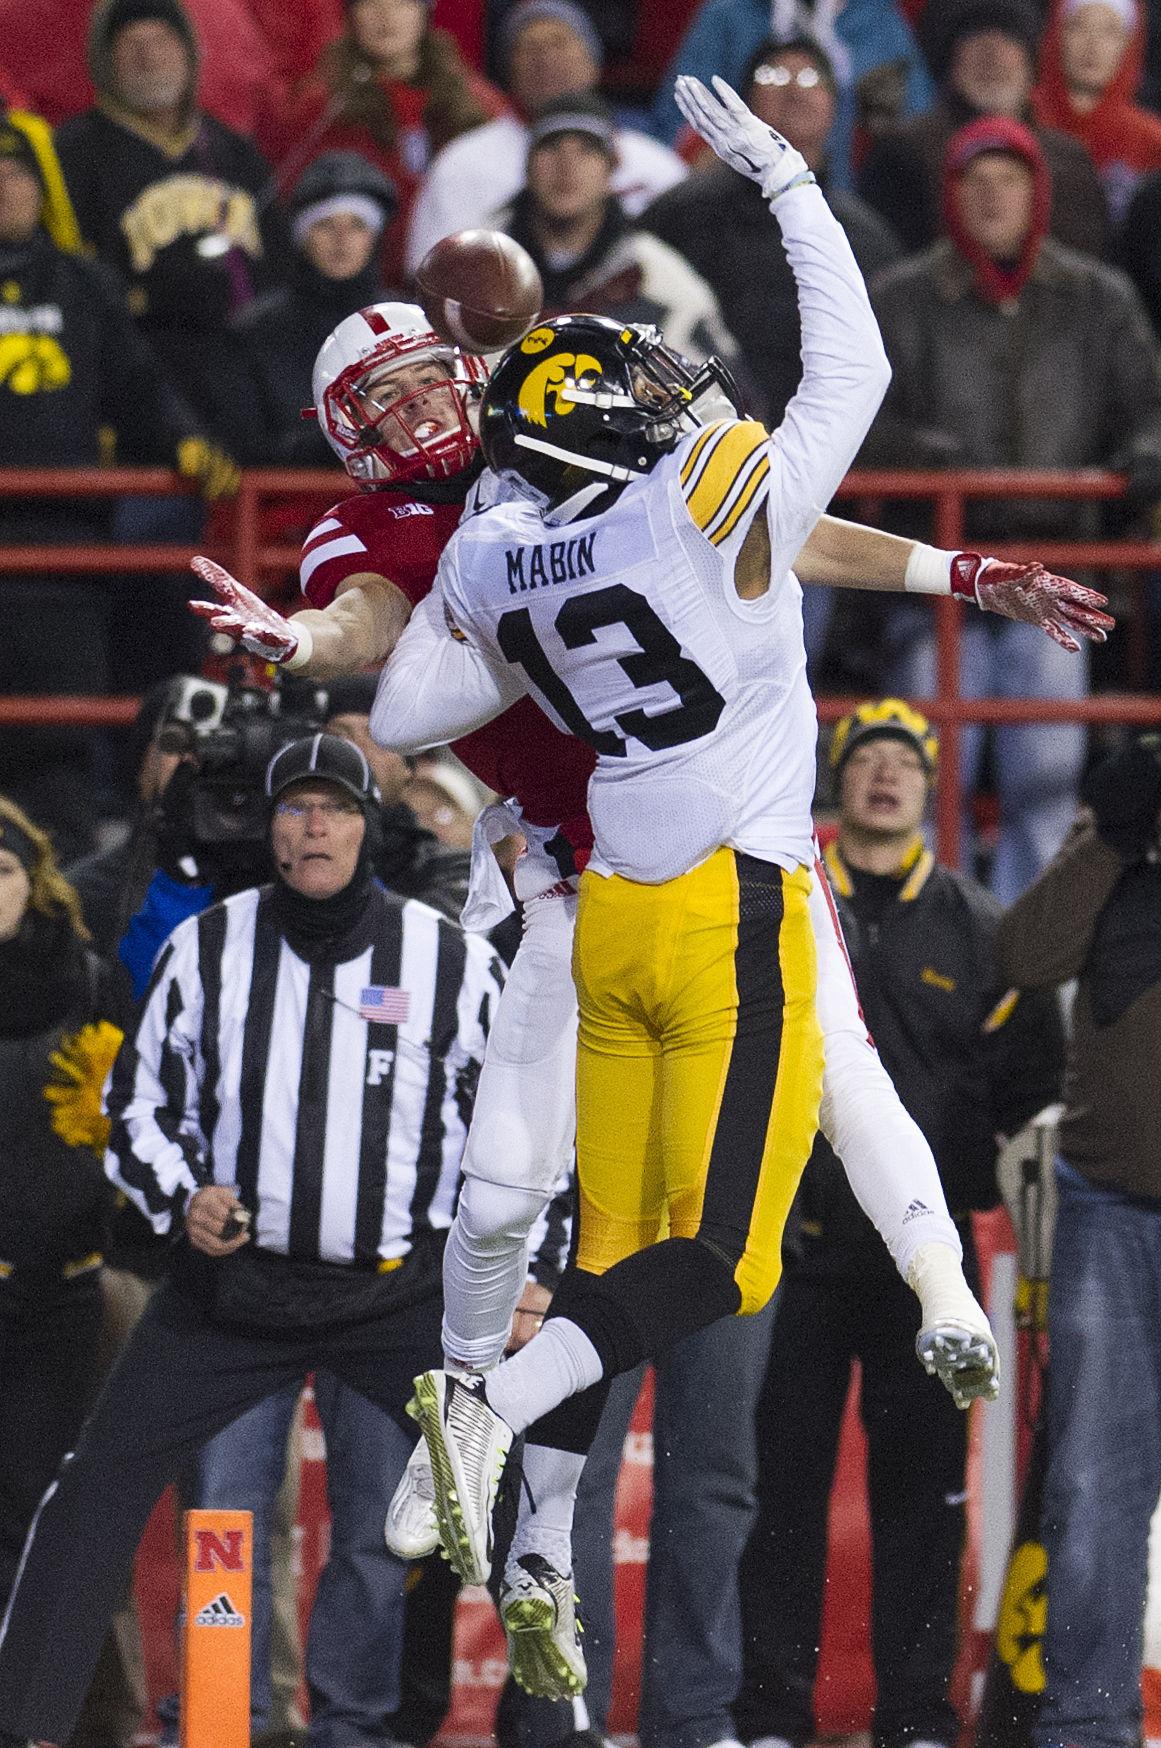 Iowa vs. Nebraska, 11.27.15